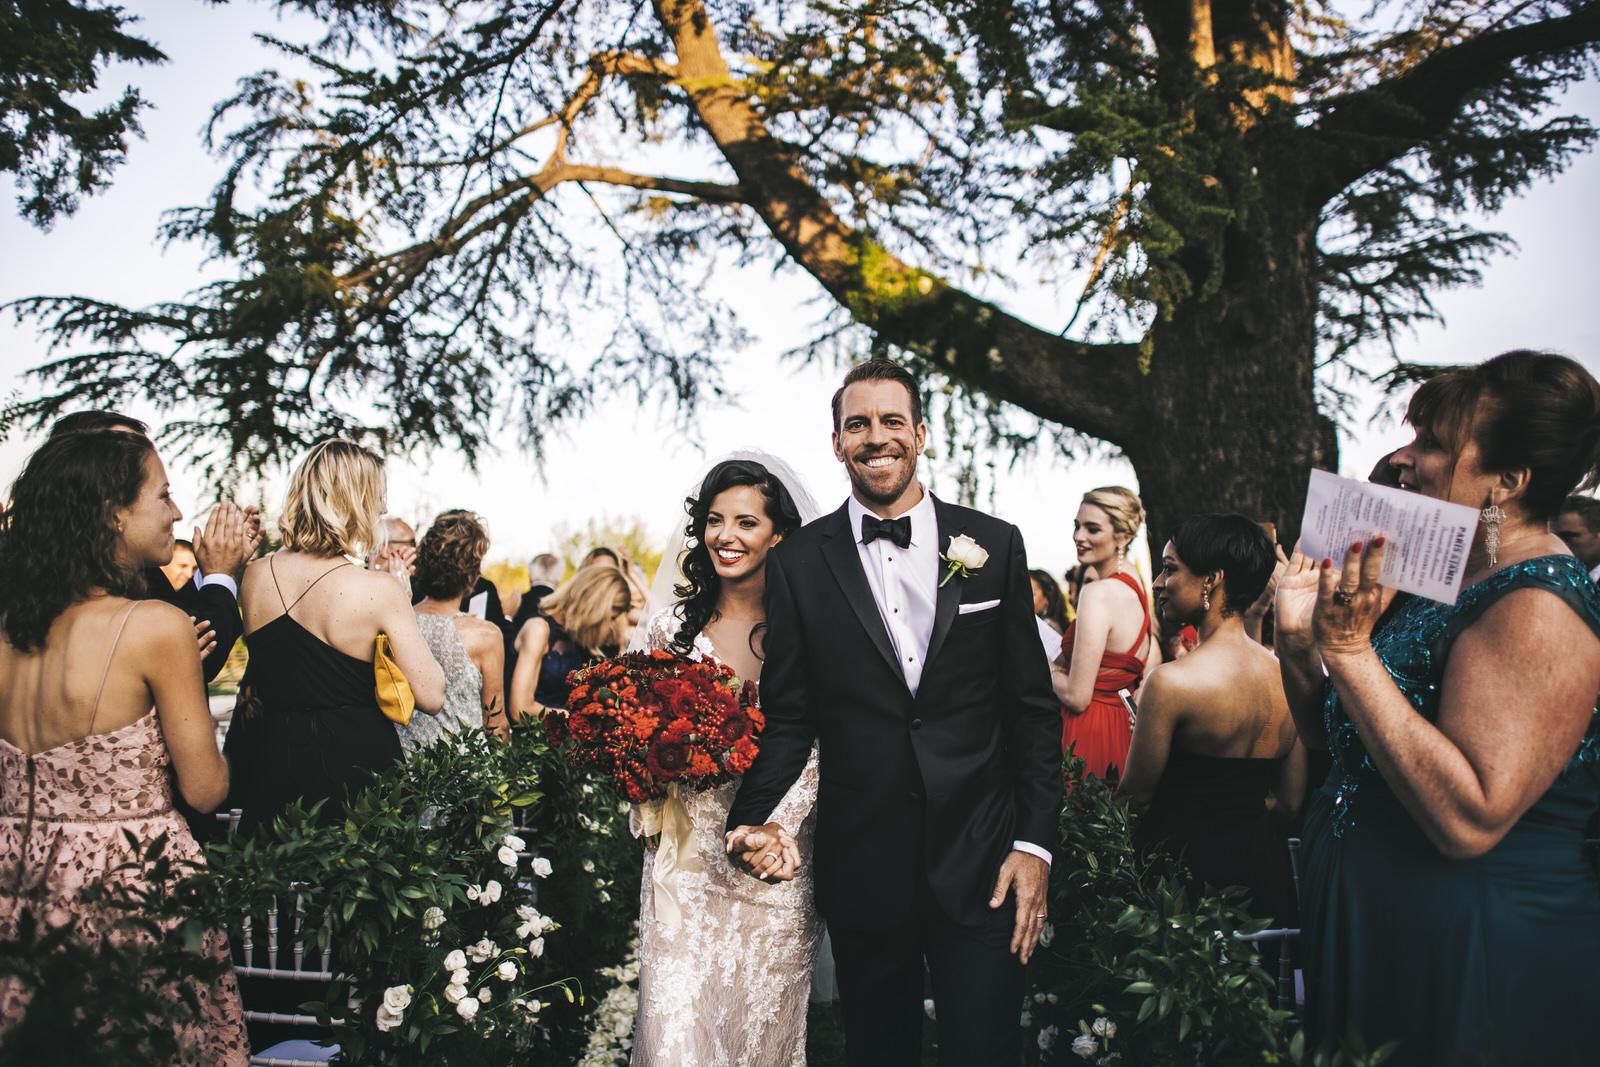 wedding photographer in italy-venice-tuscany-florence-amalfi coast-como lake-villa del balbianello-siena-amalfi-ravello-belmond-villa cimbrone33